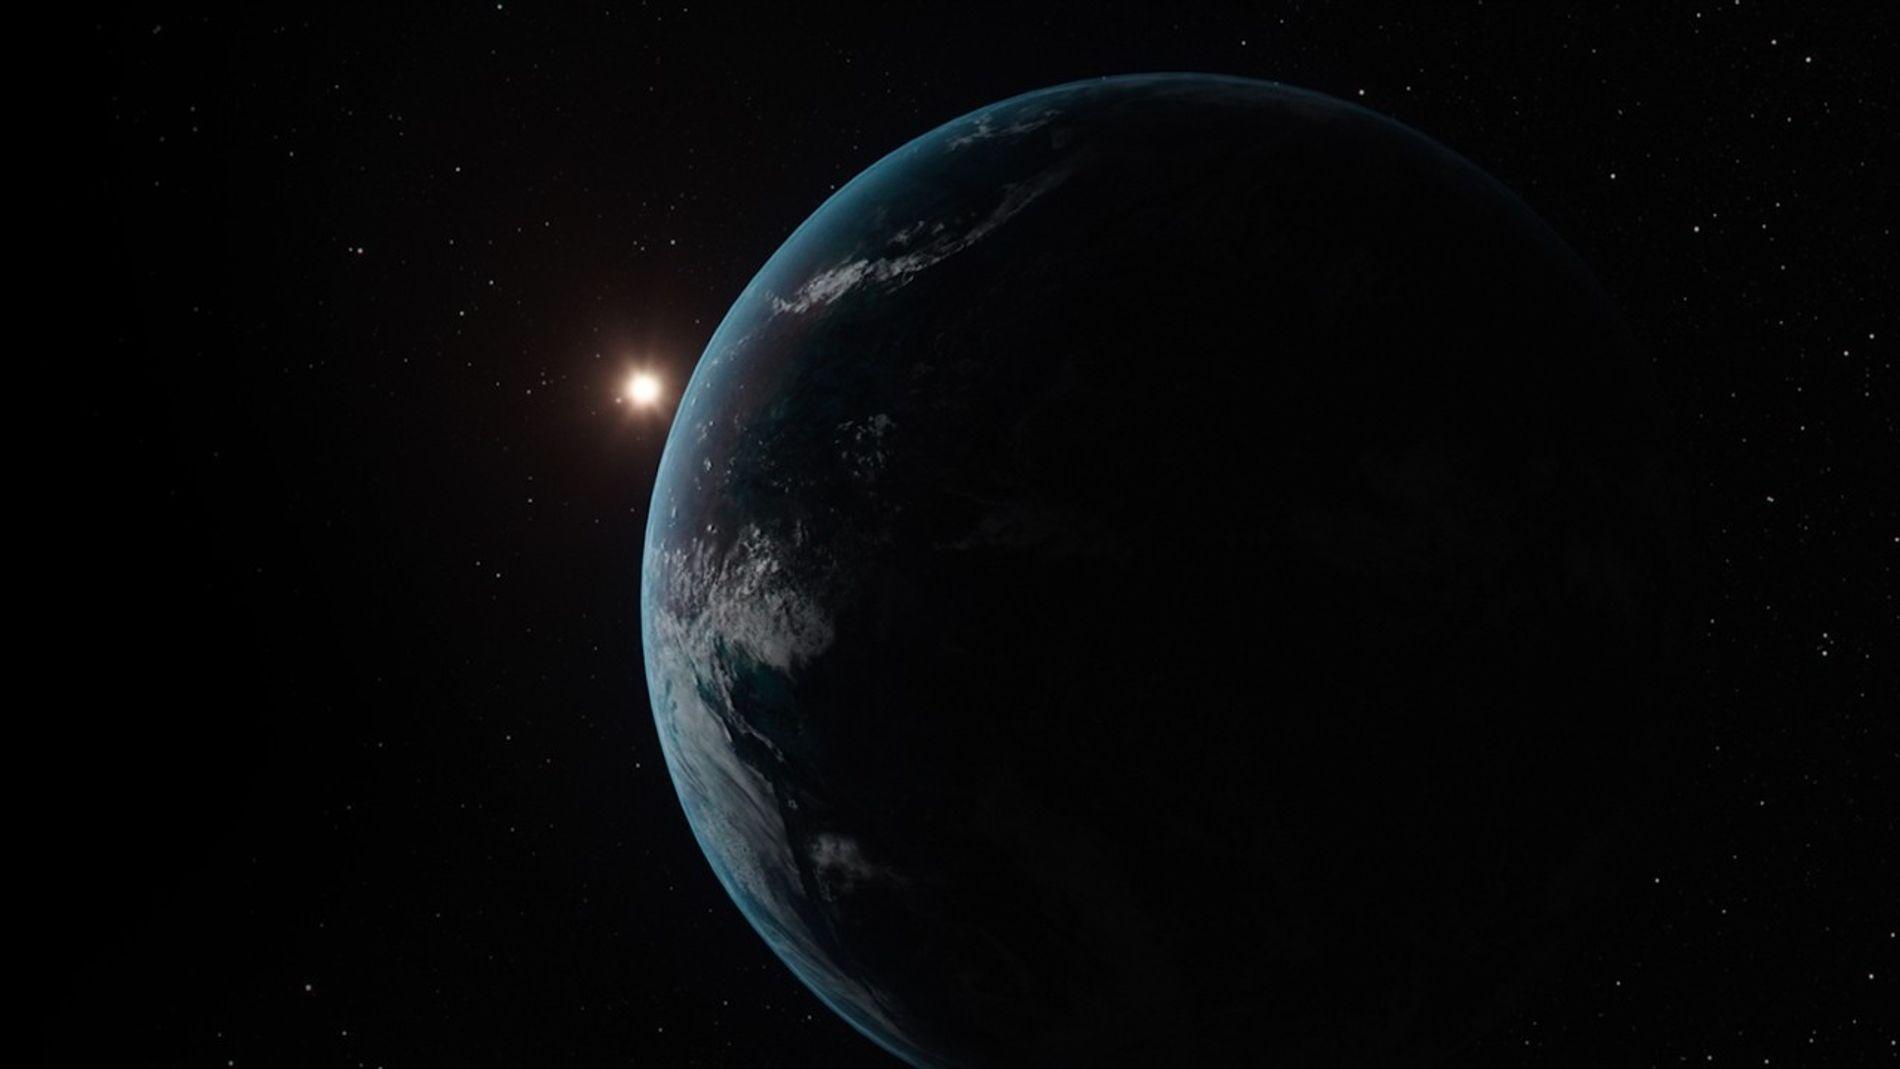 Punto azul pálido - Trigésimo aniversario | Cosmos: Mundos Posibles